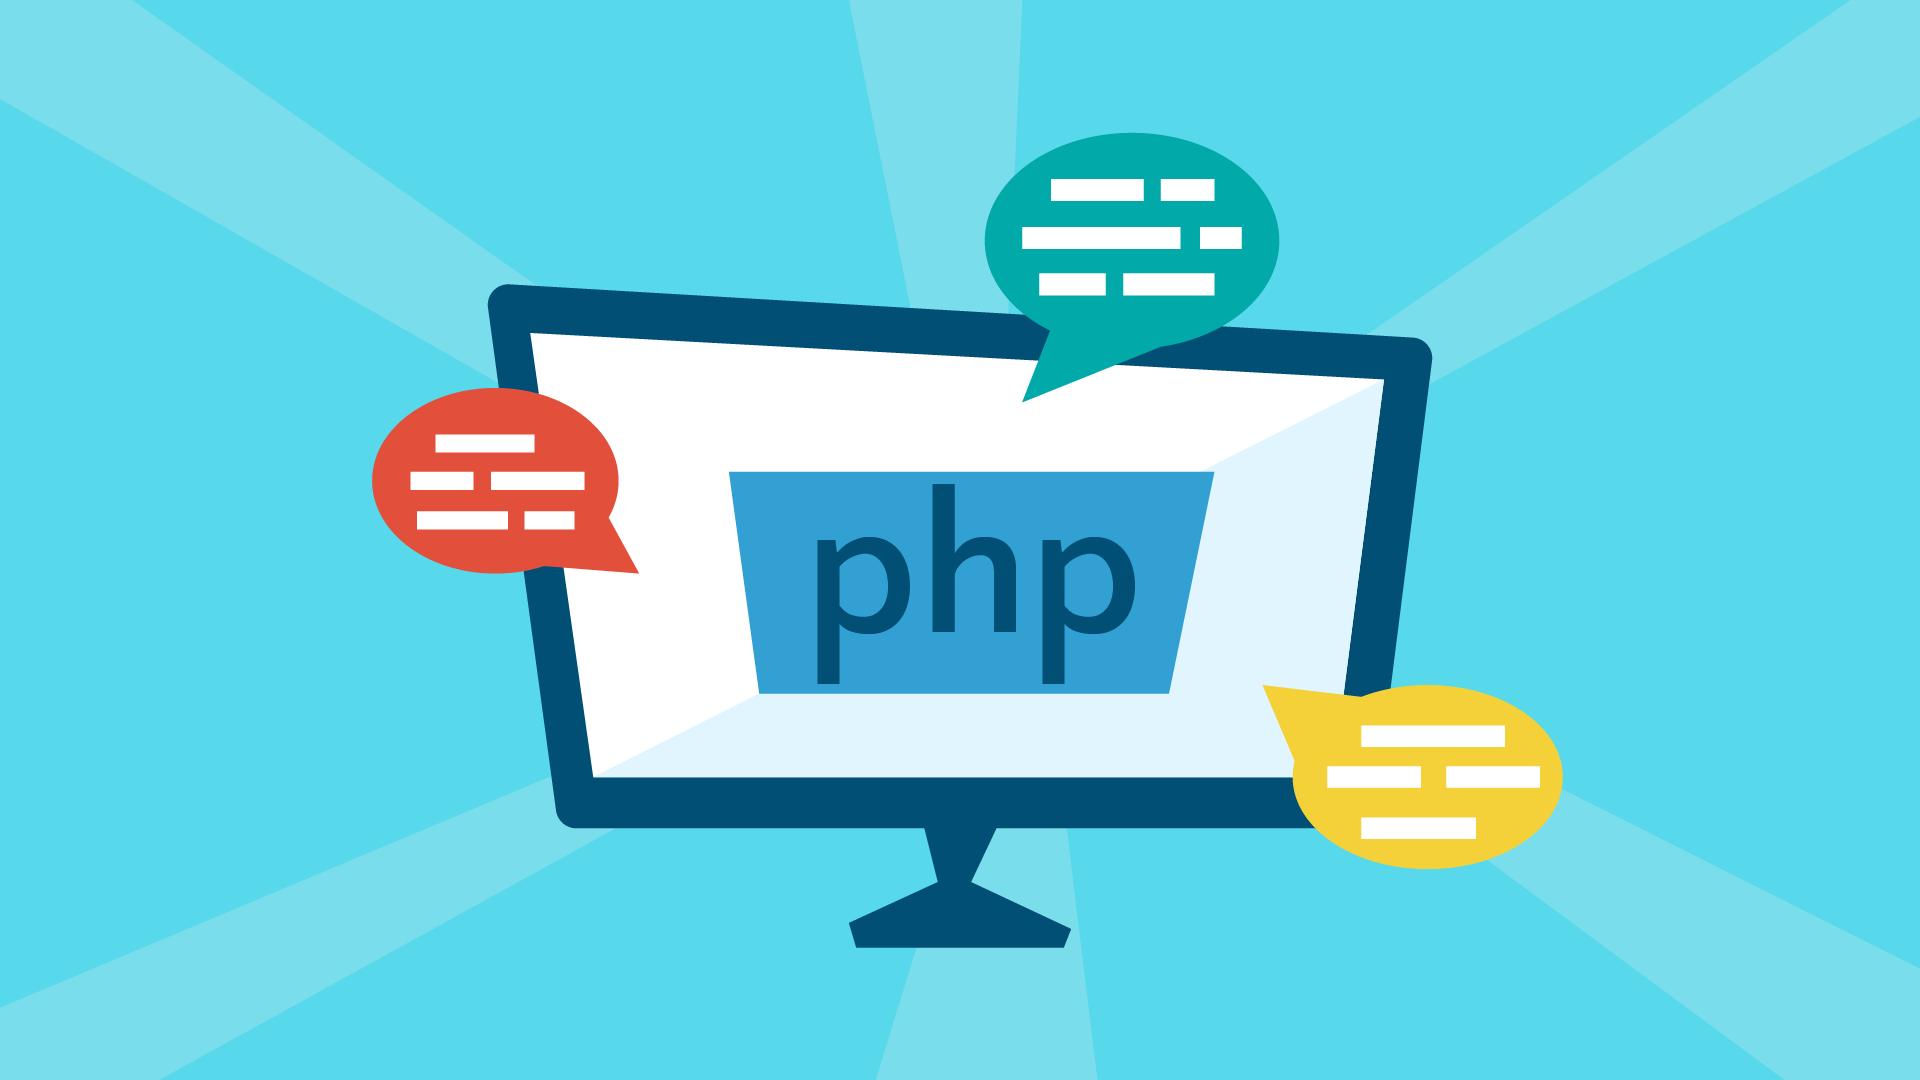 Вебинар Типы данных в PHP фото